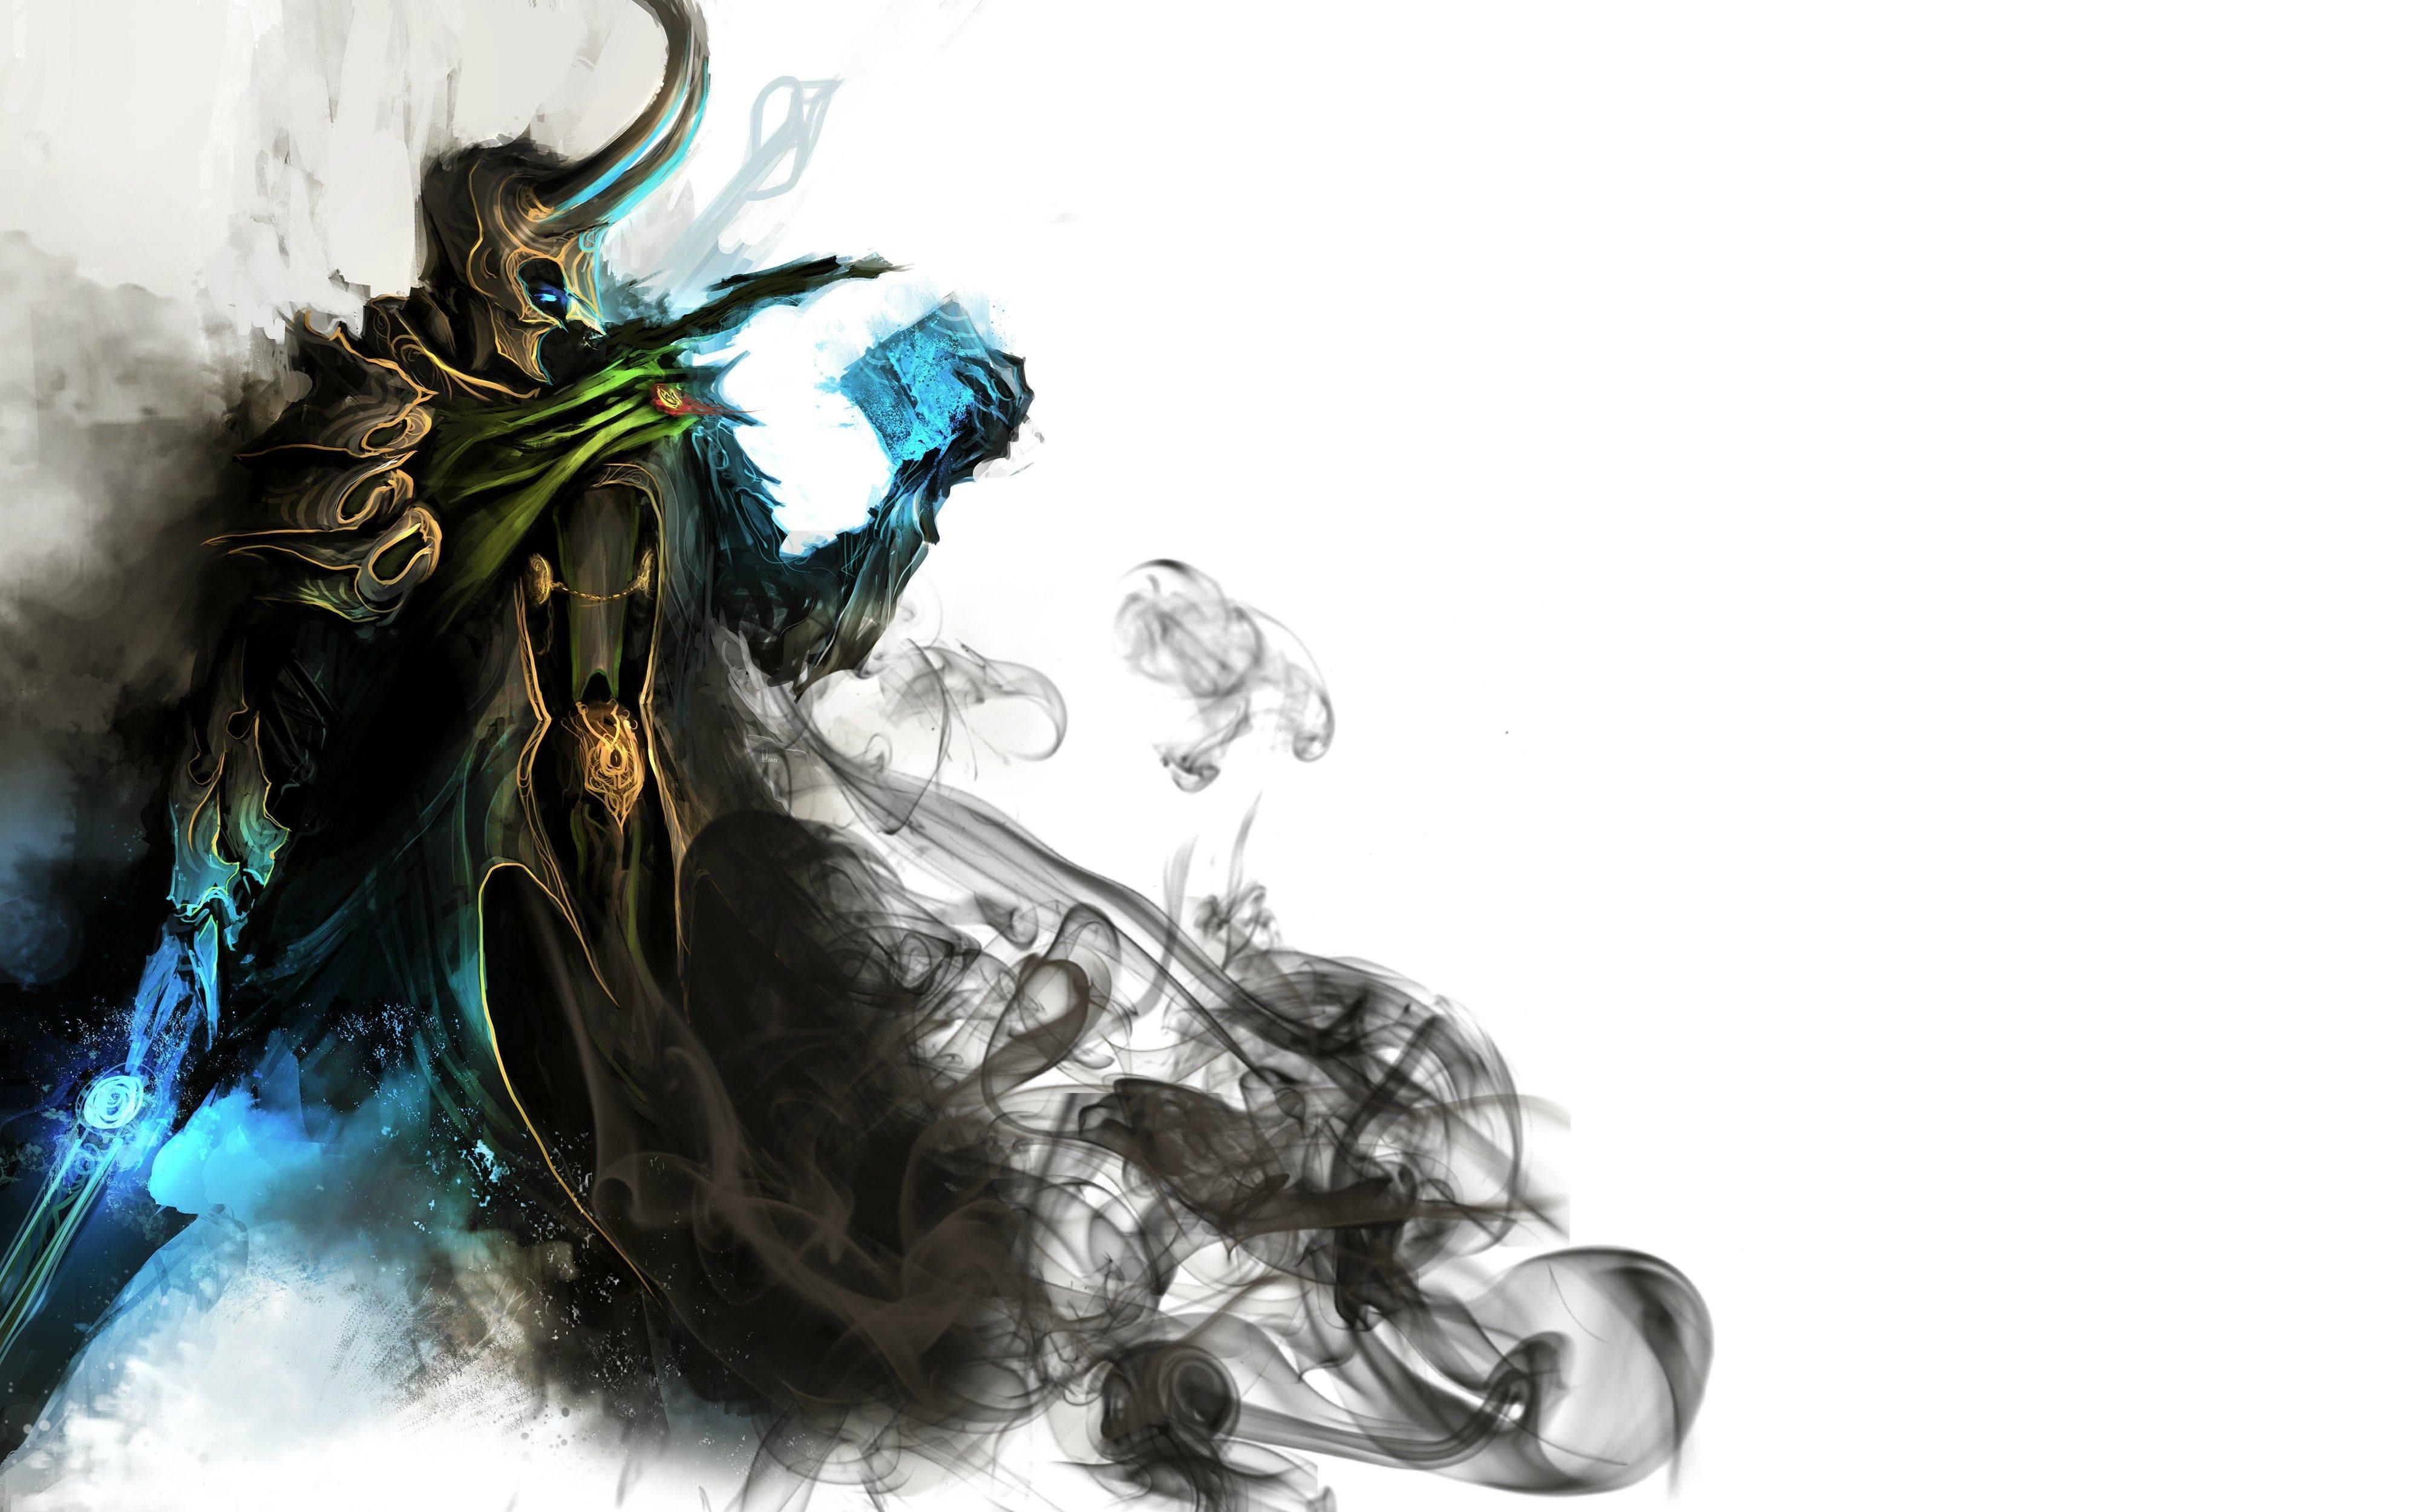 Good Wallpaper Marvel Loki - drawing-illustration-comics-medieval-Loki-sketch-fictional-character-178597  Picture_504279.jpg